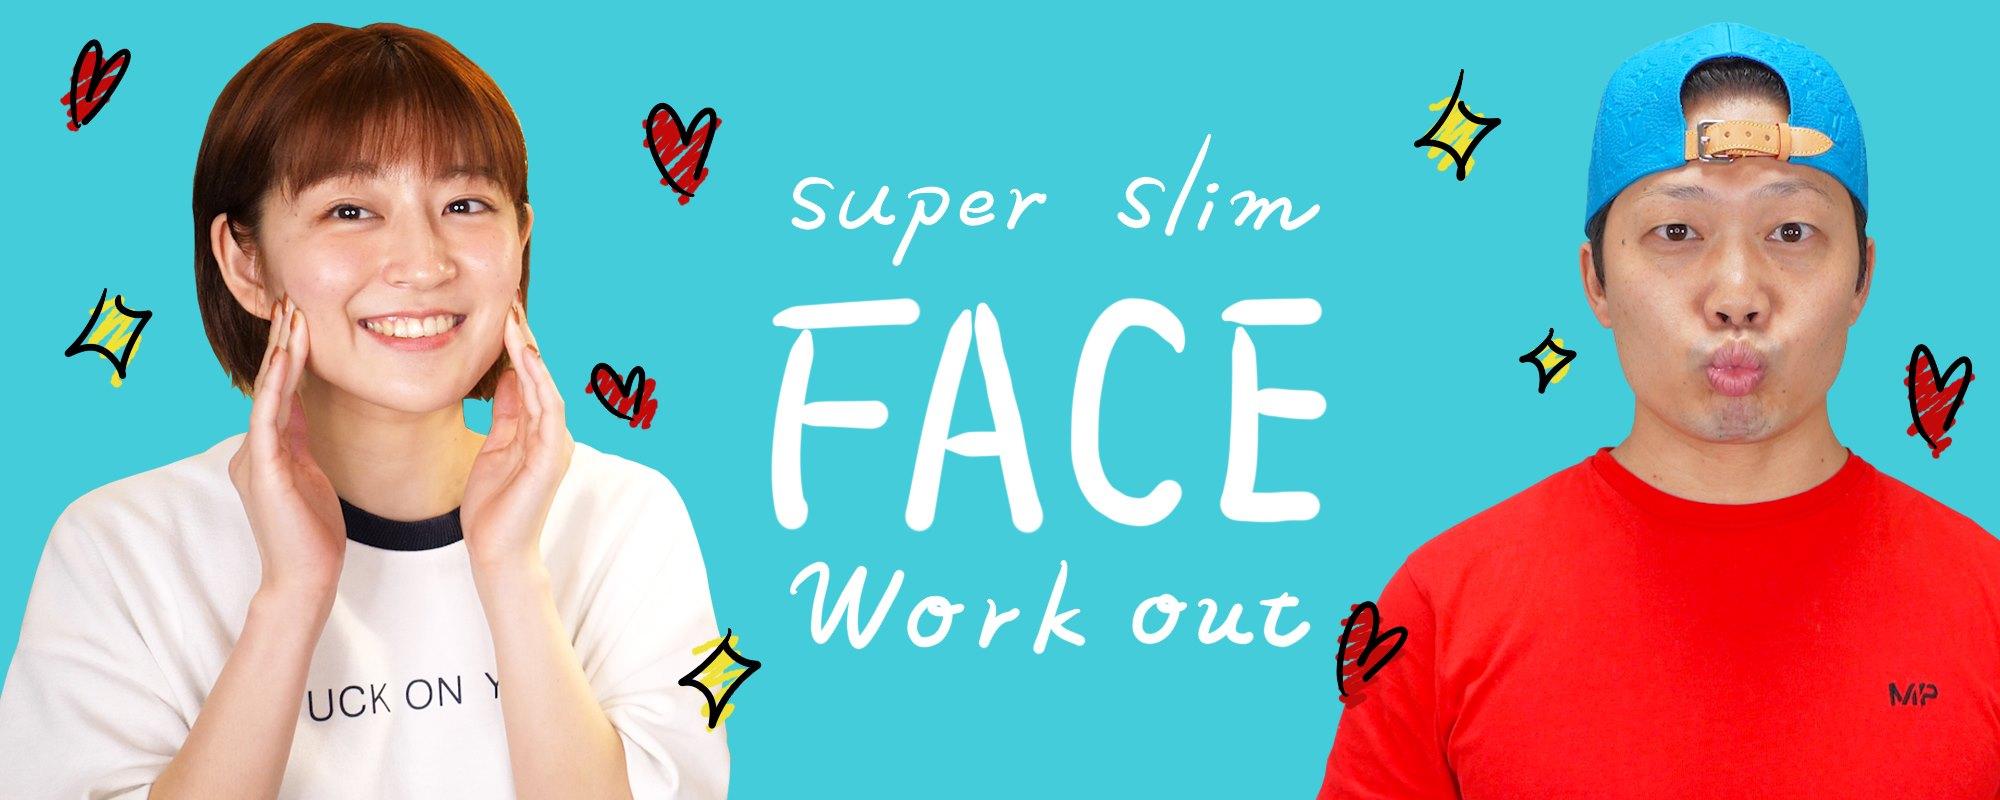 Lose face fat 7 days program